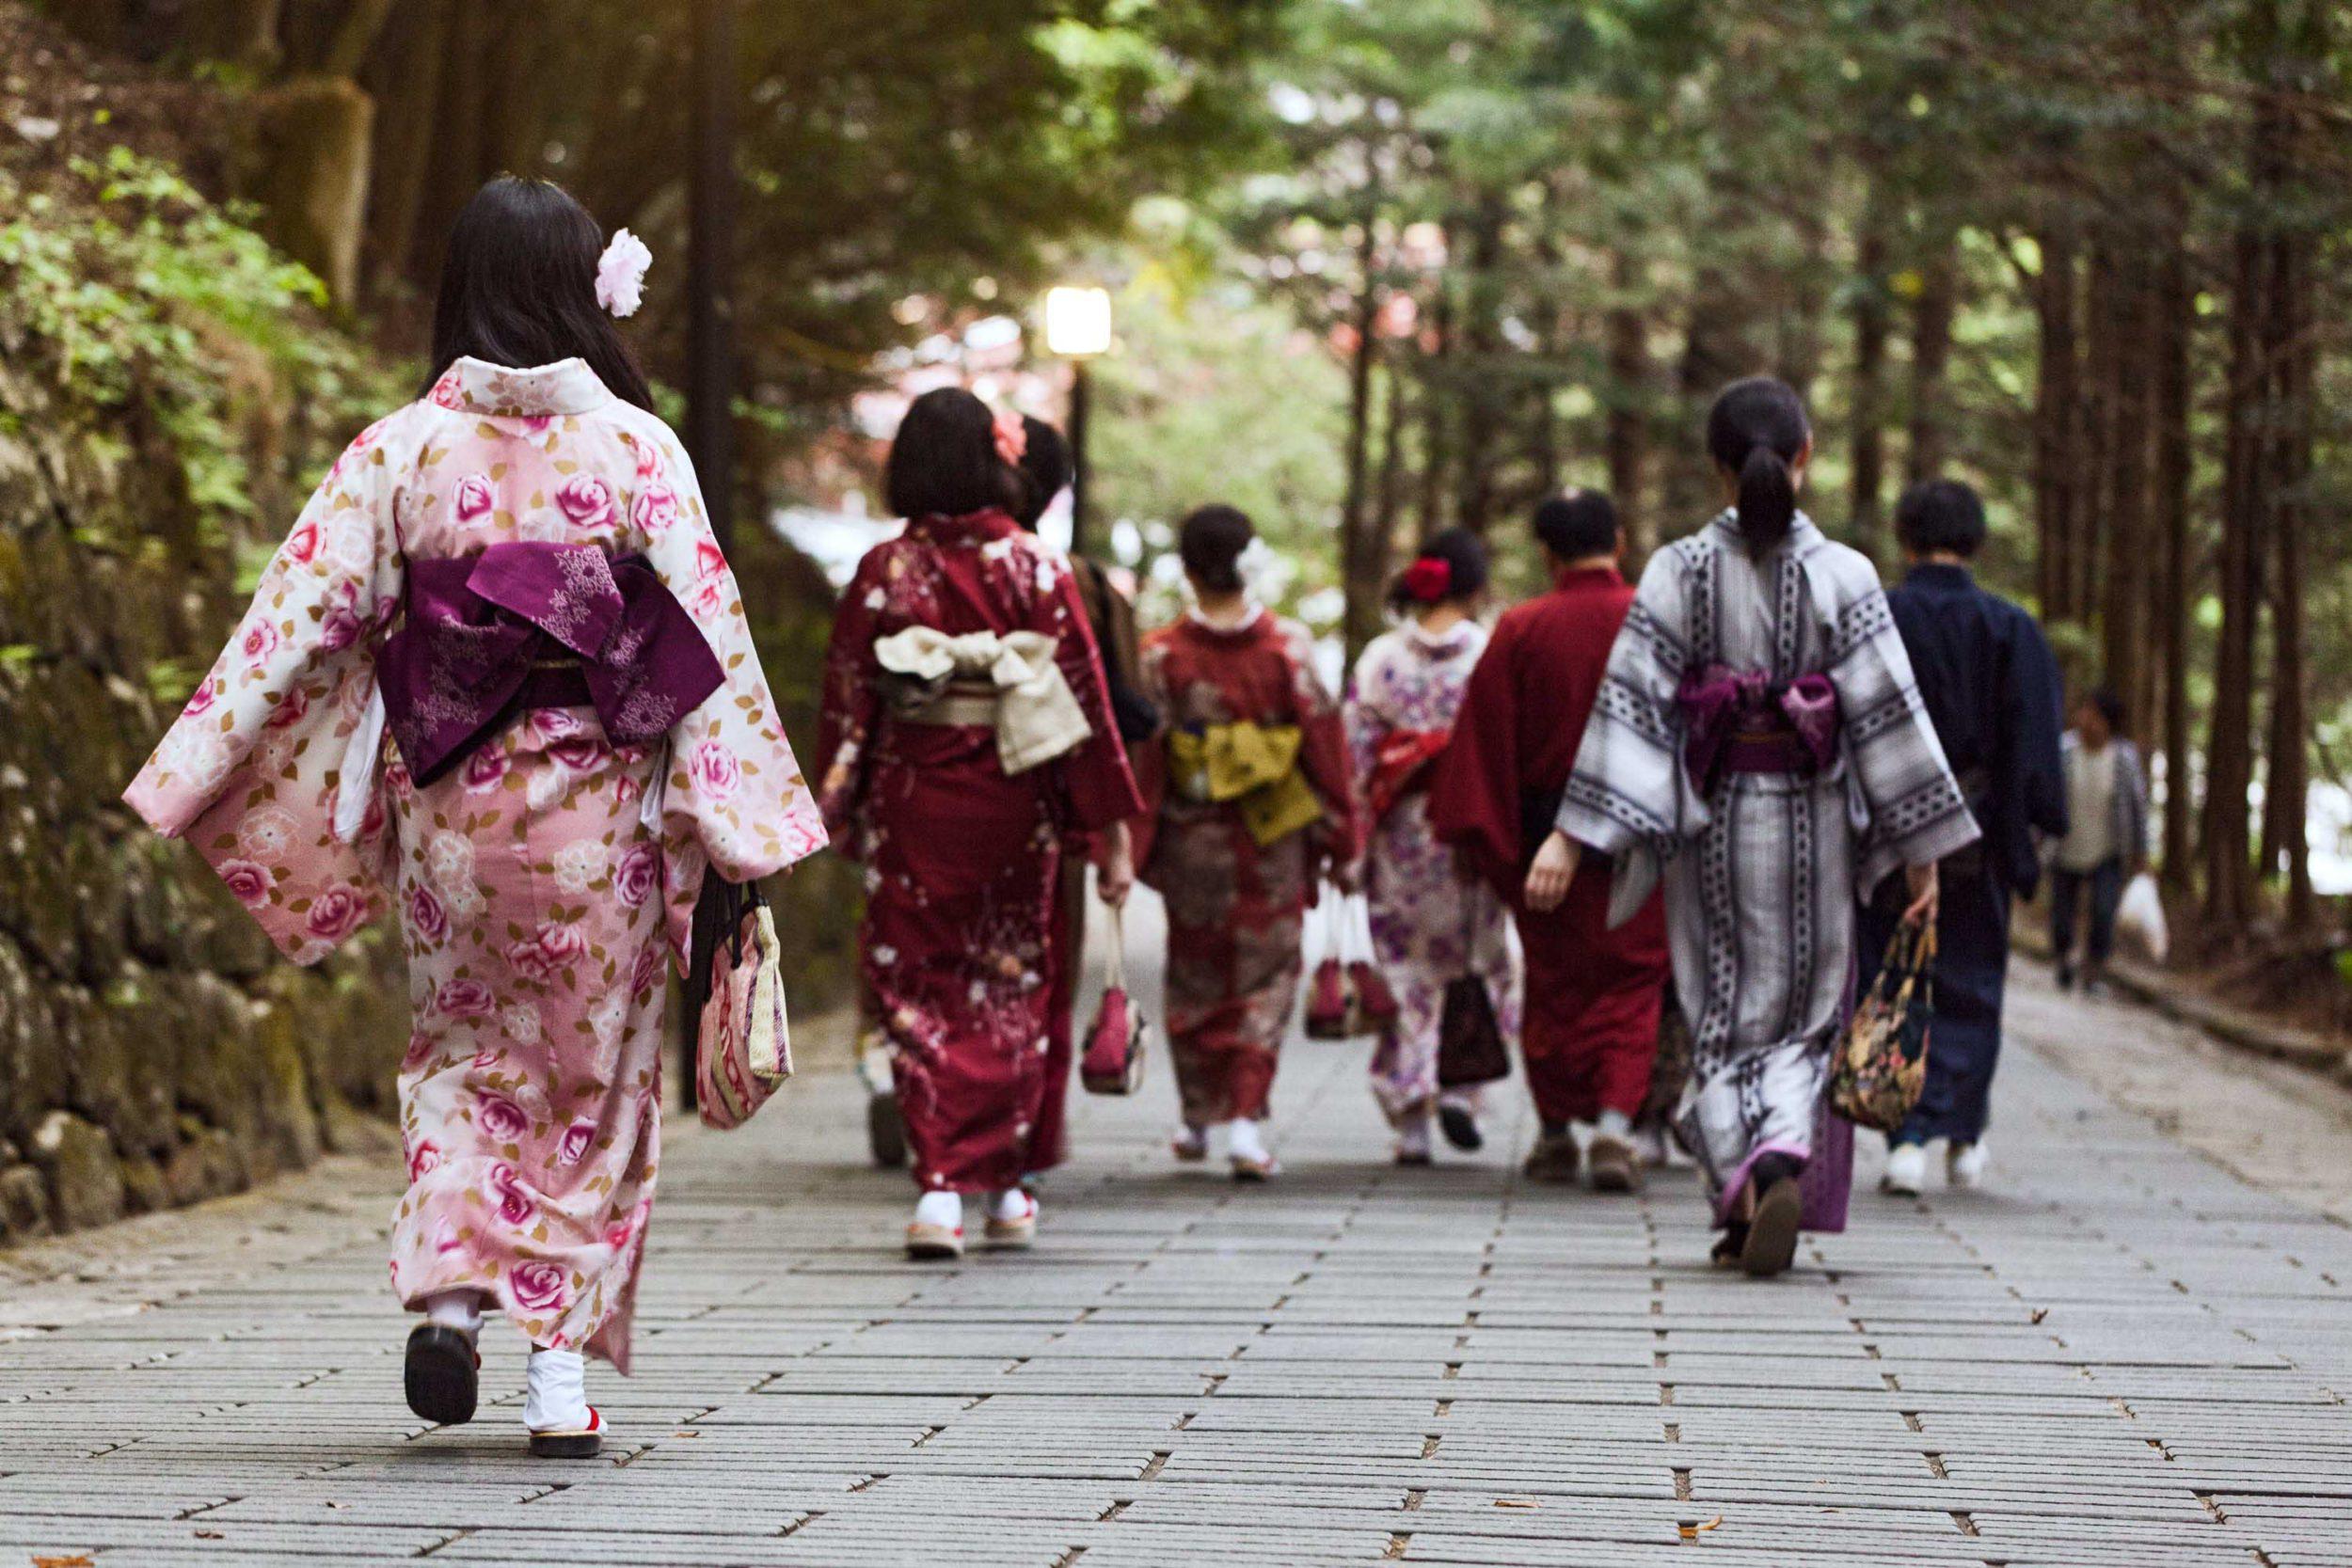 Japan, Tom Kluyver, Photography, portfolio, people